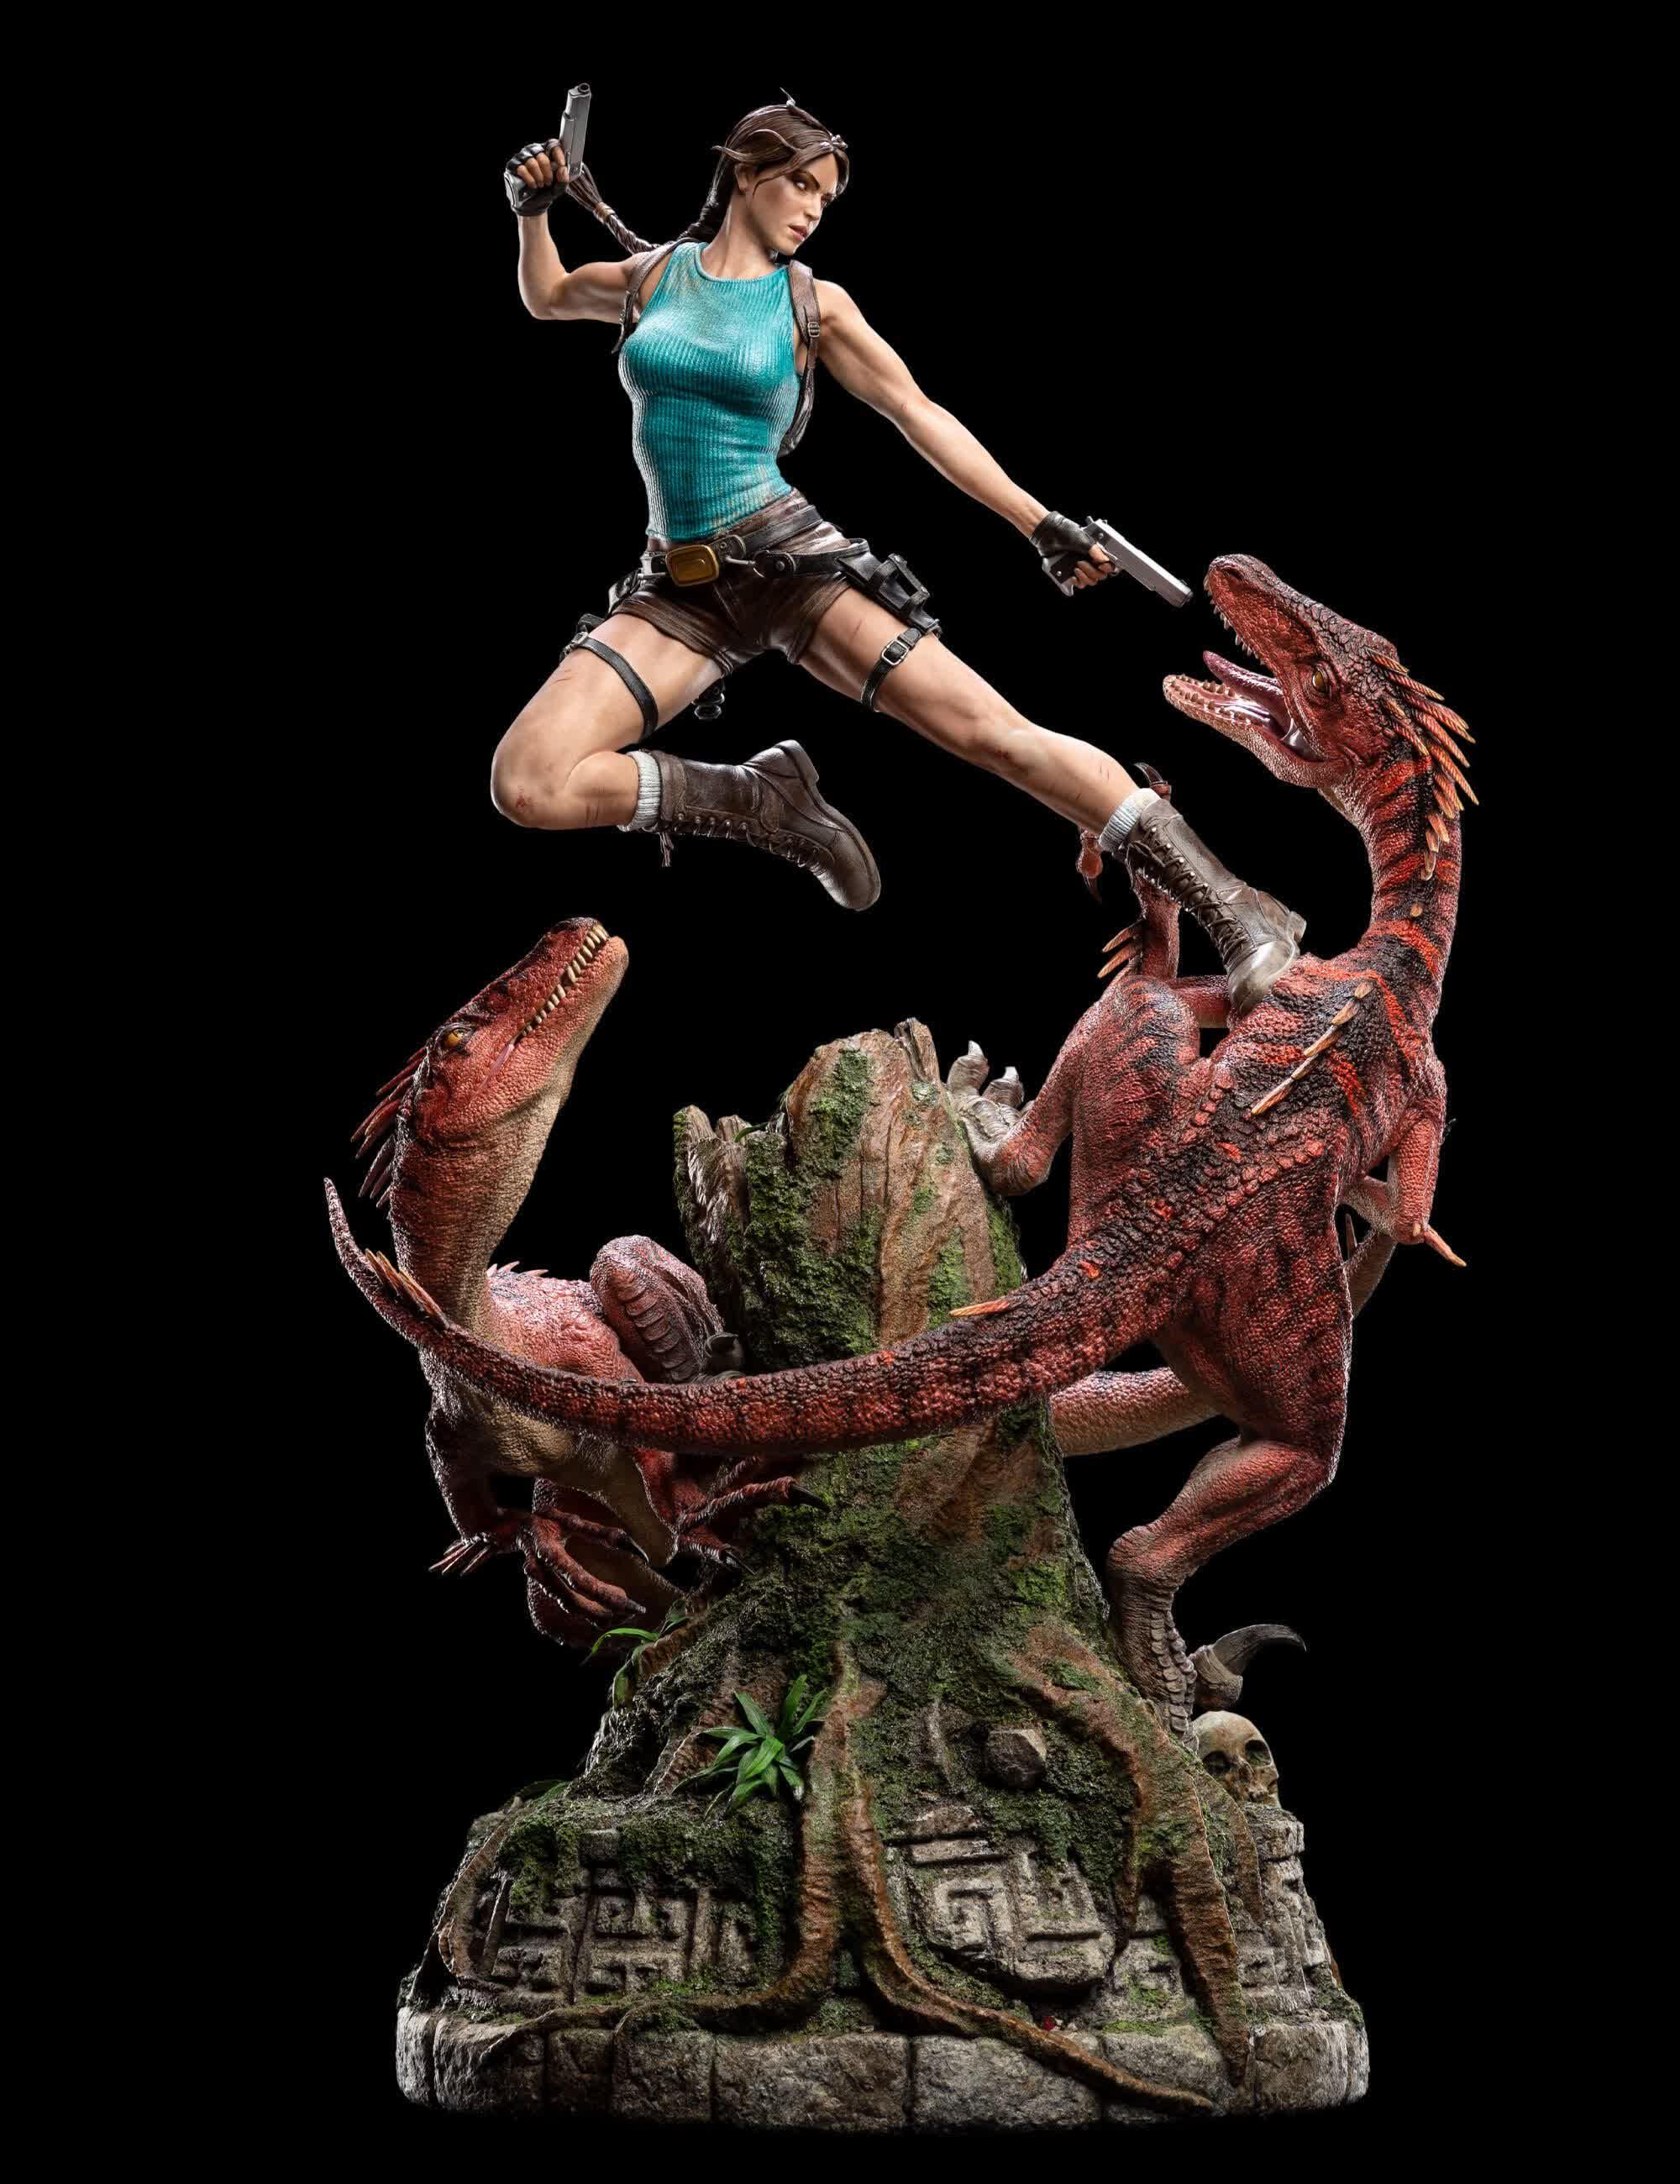 Weta Workshop devoile la figurine de 1500 de Lara